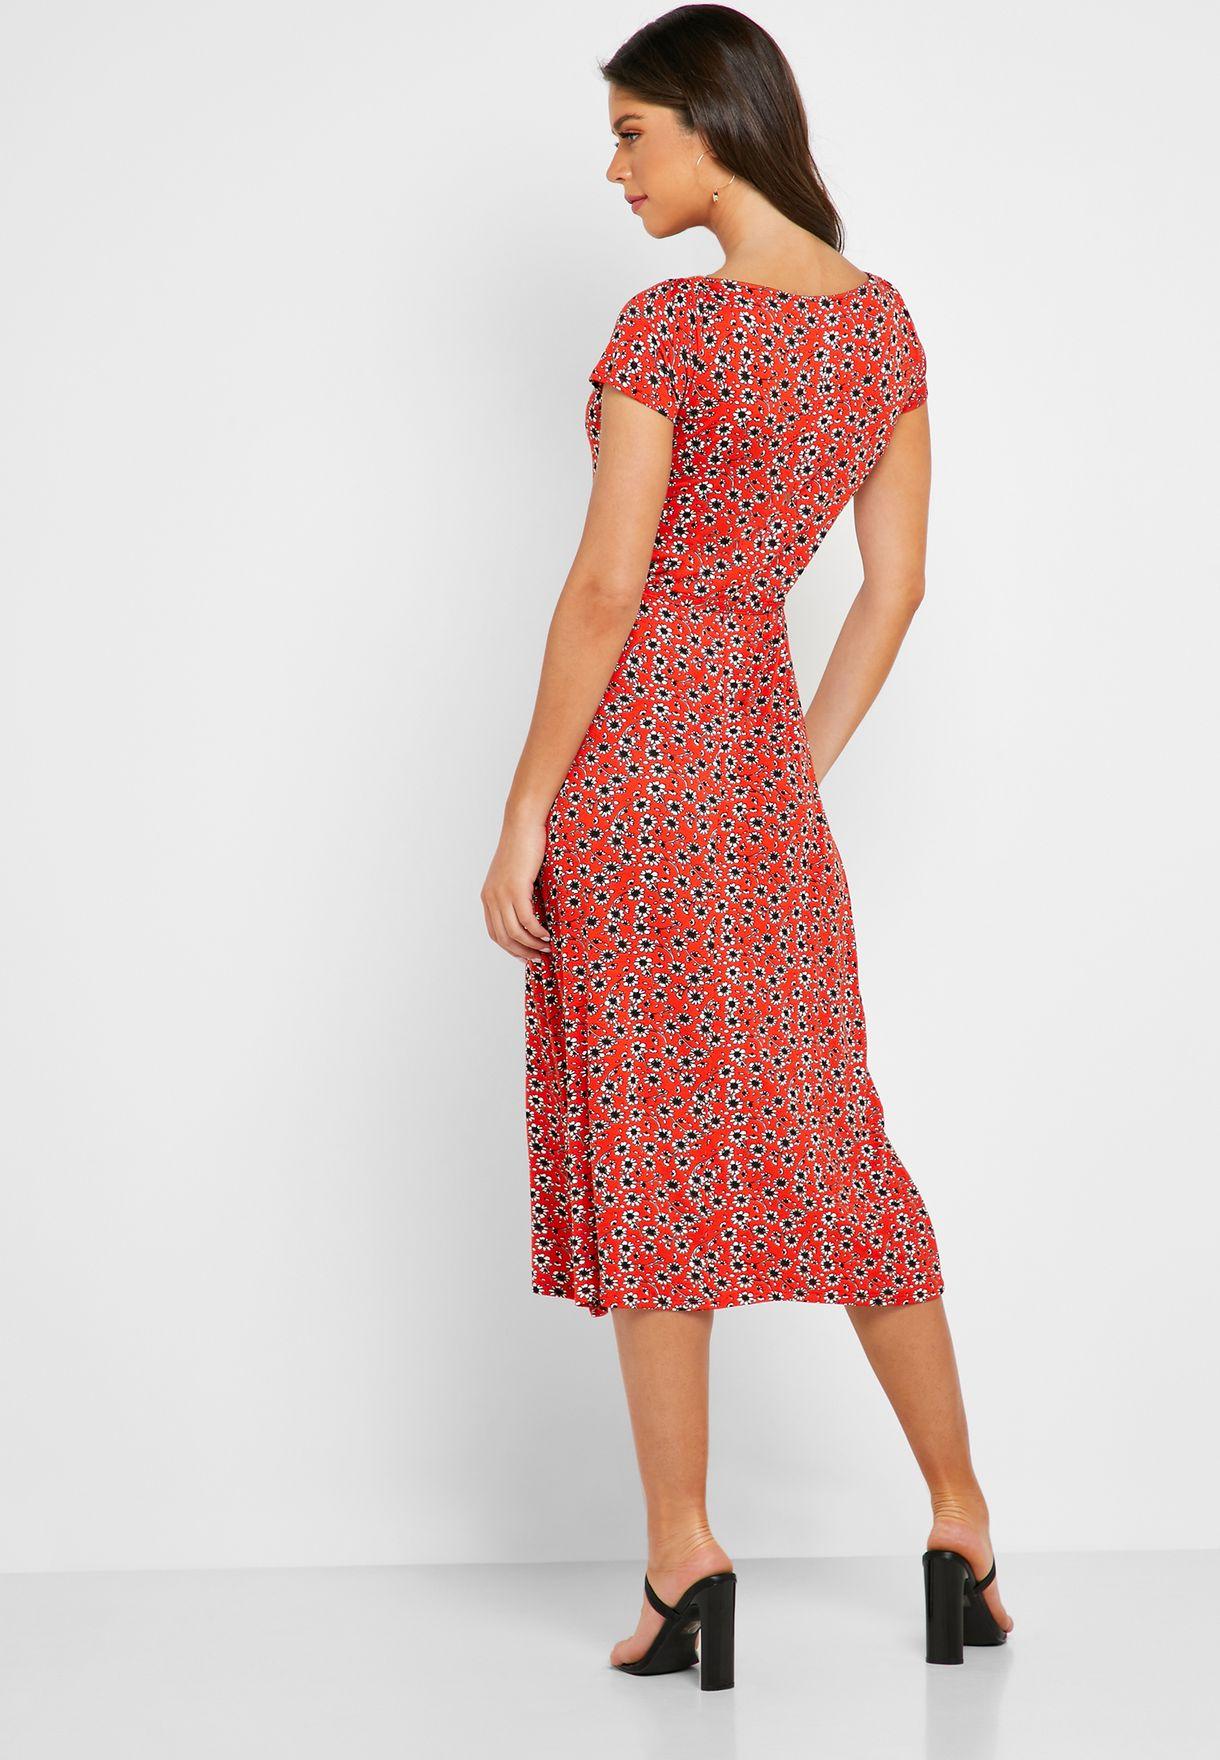 Floral Print Short Sleeve Dress